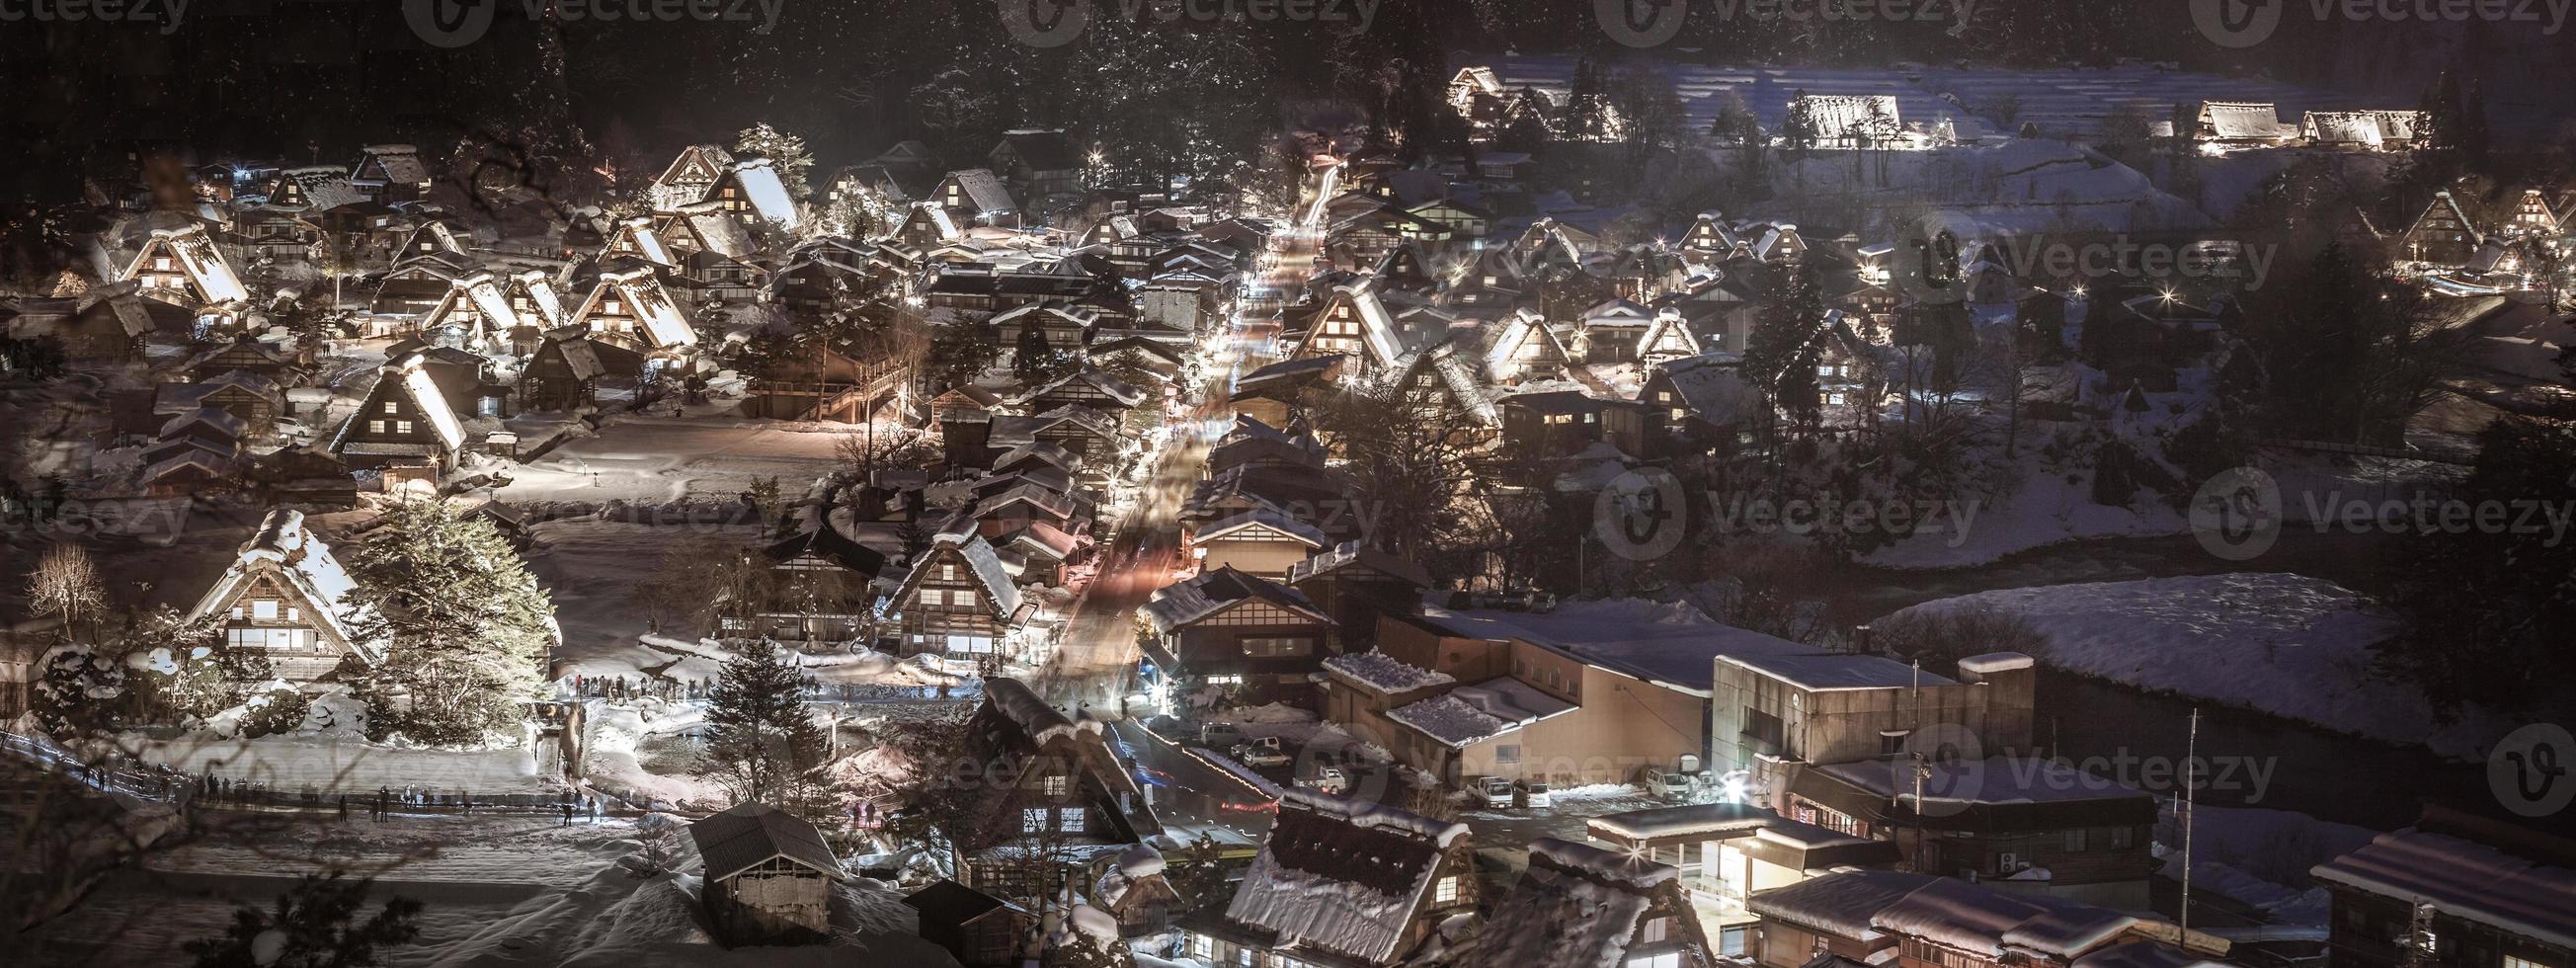 Shirakawa-Go Winterlicht foto